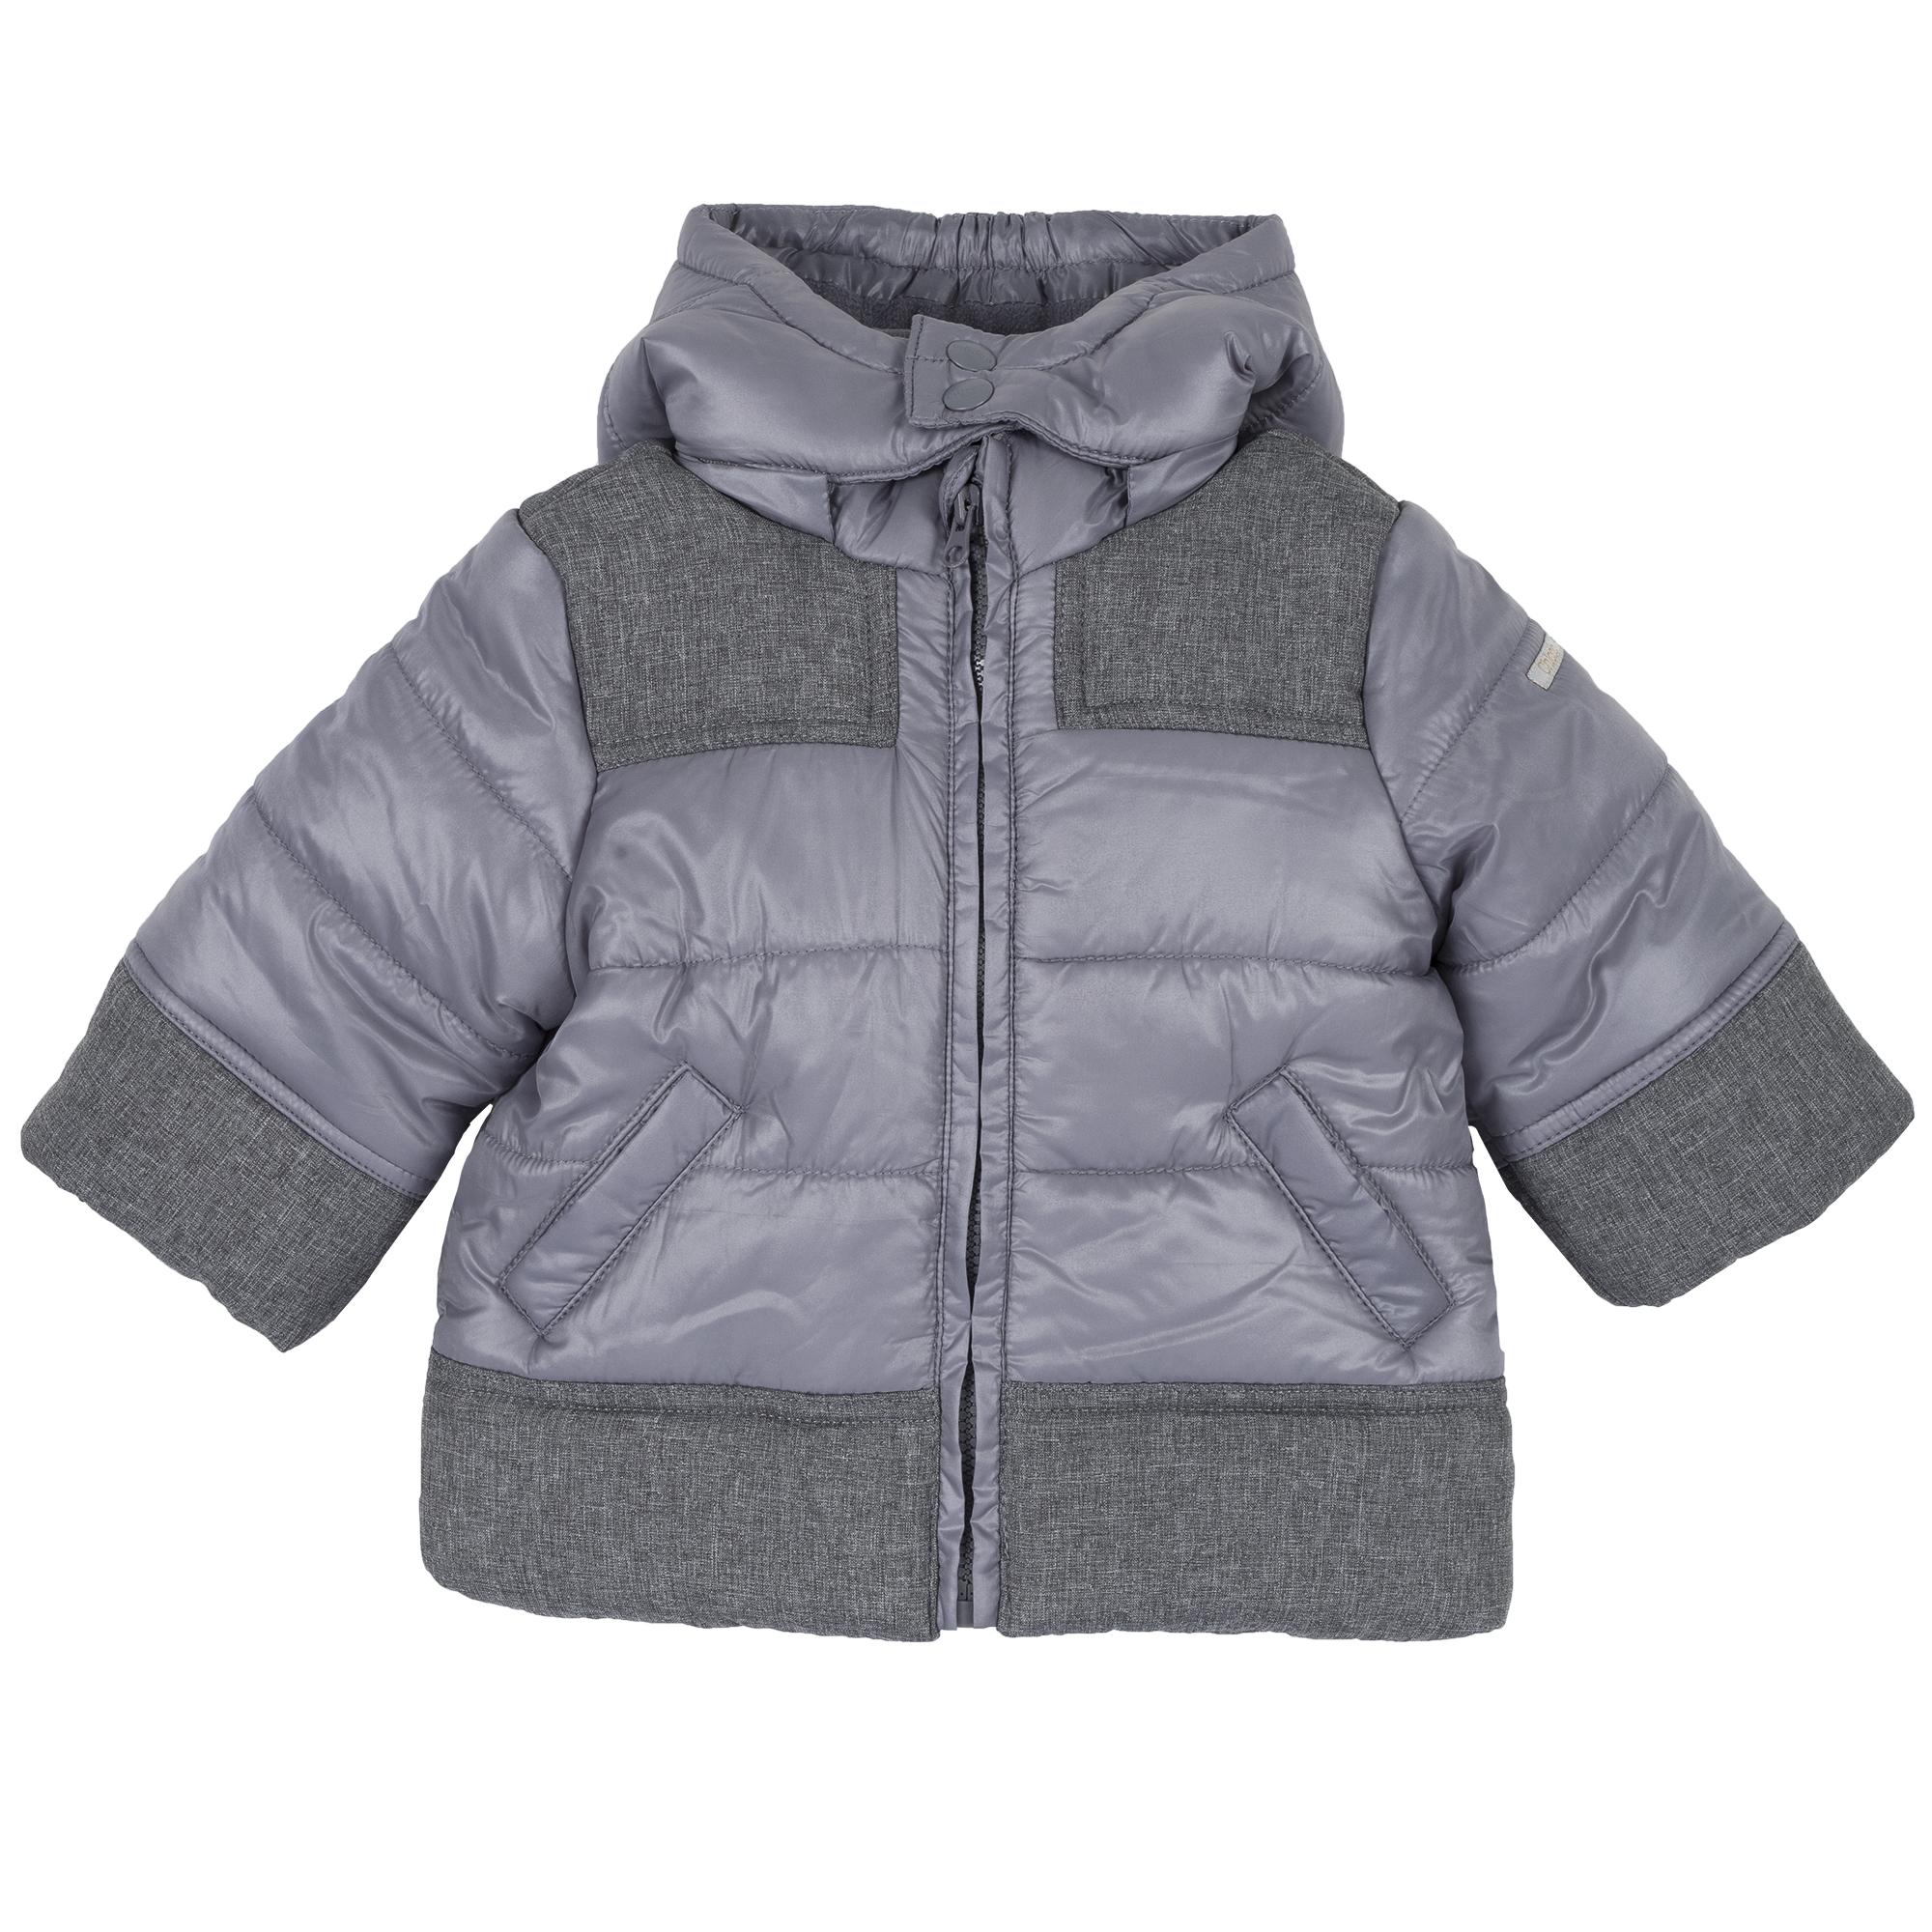 Jacheta copii Chicco ThermoSoft, gluga detasabila, gri, 87403 din categoria Jachete copii